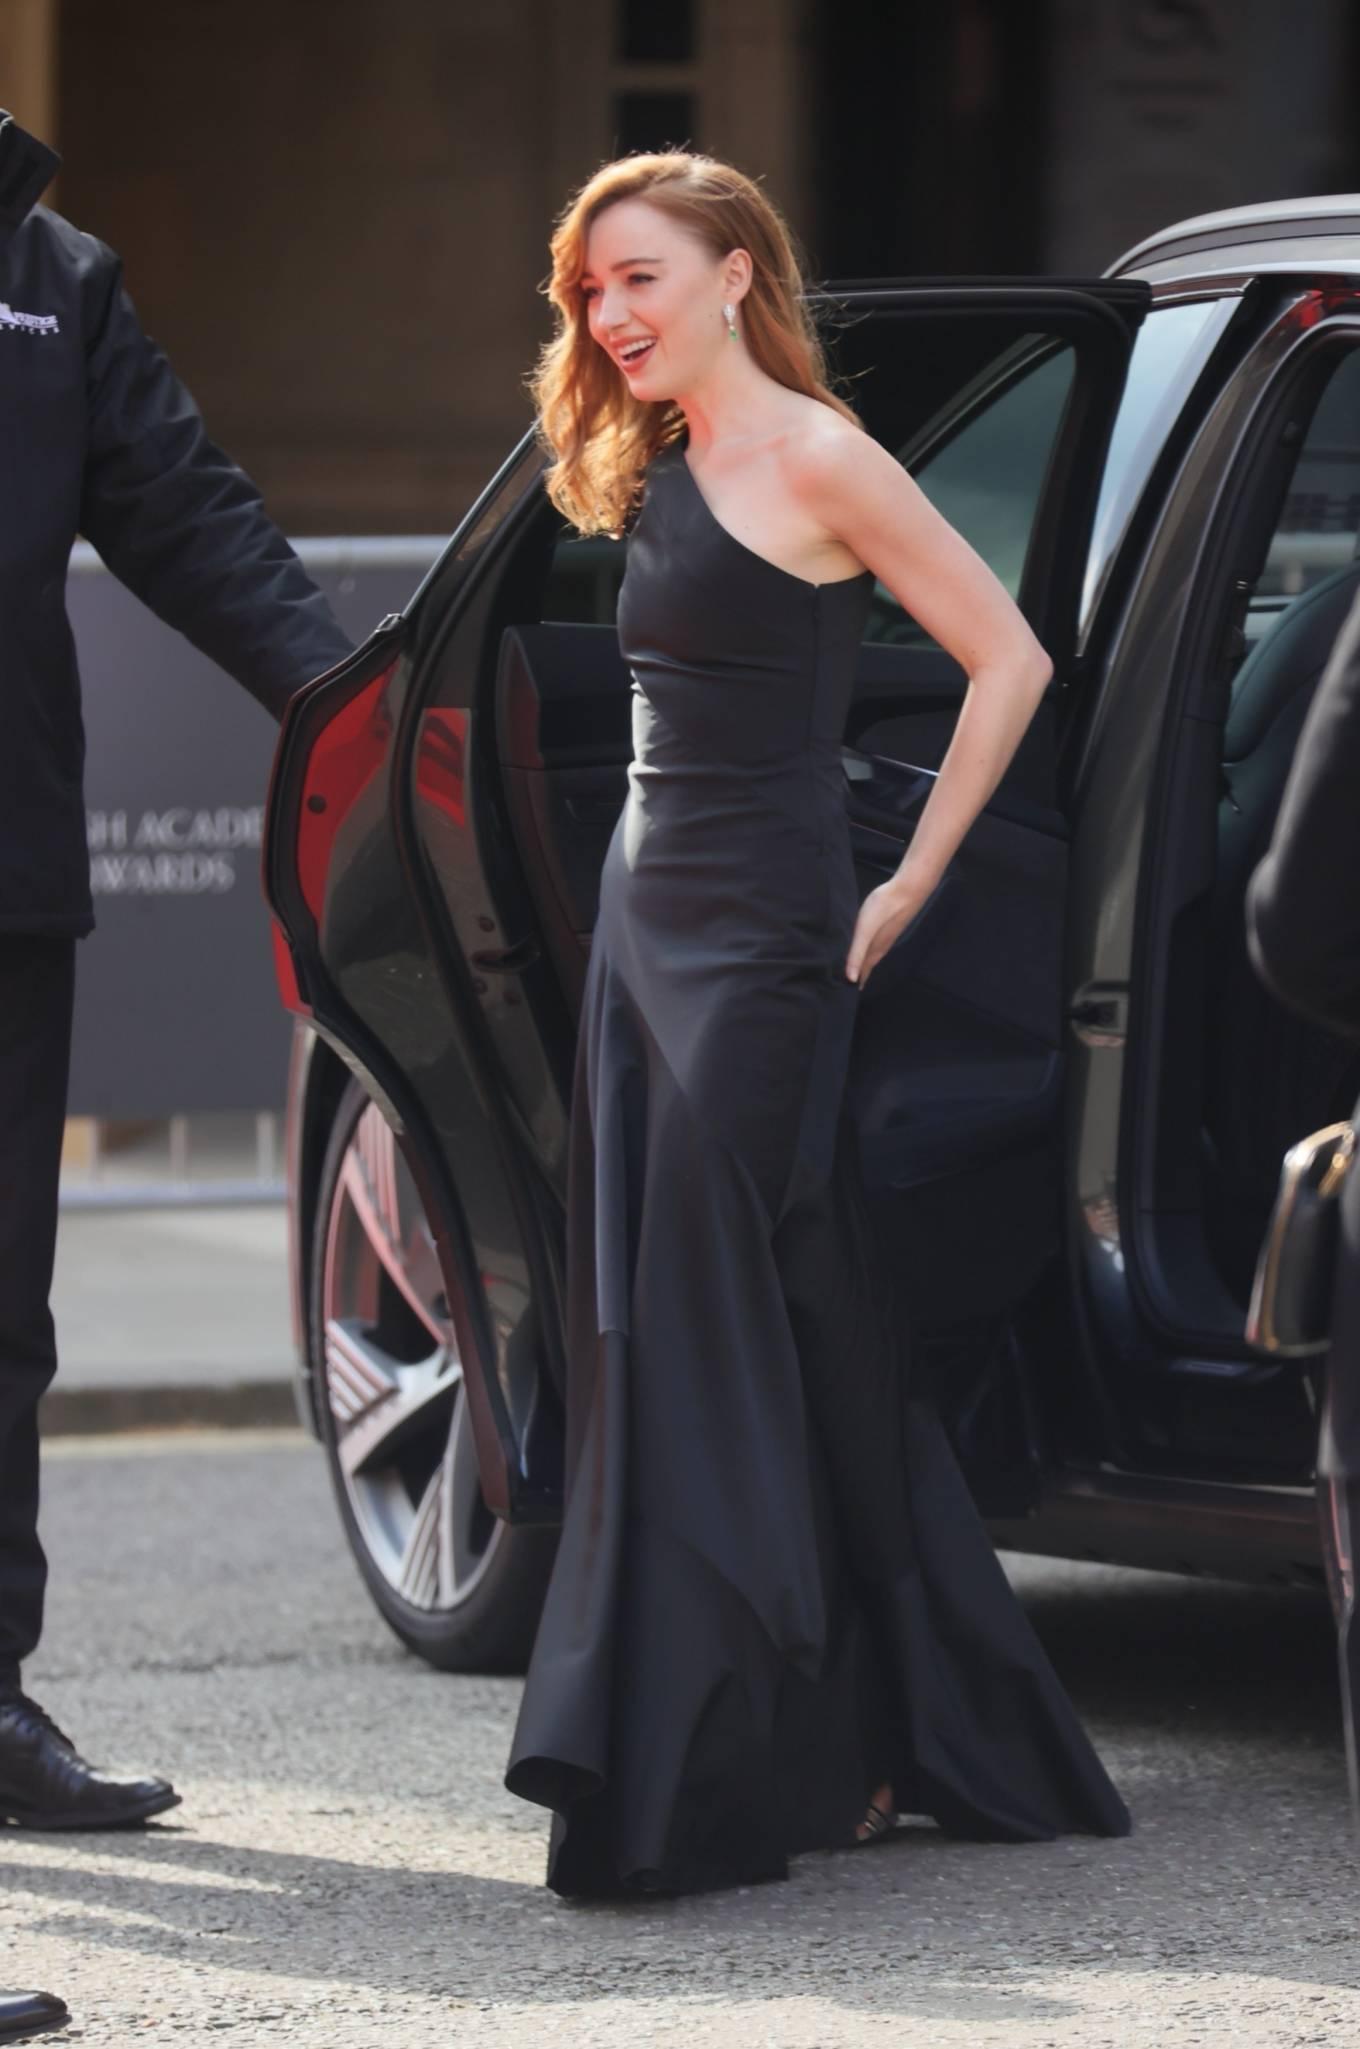 Phoebe Dynevor 2021 : Phoebe Dynevor – at the Royal Albert Hall for 2021 British Academy Film Awards in London-04